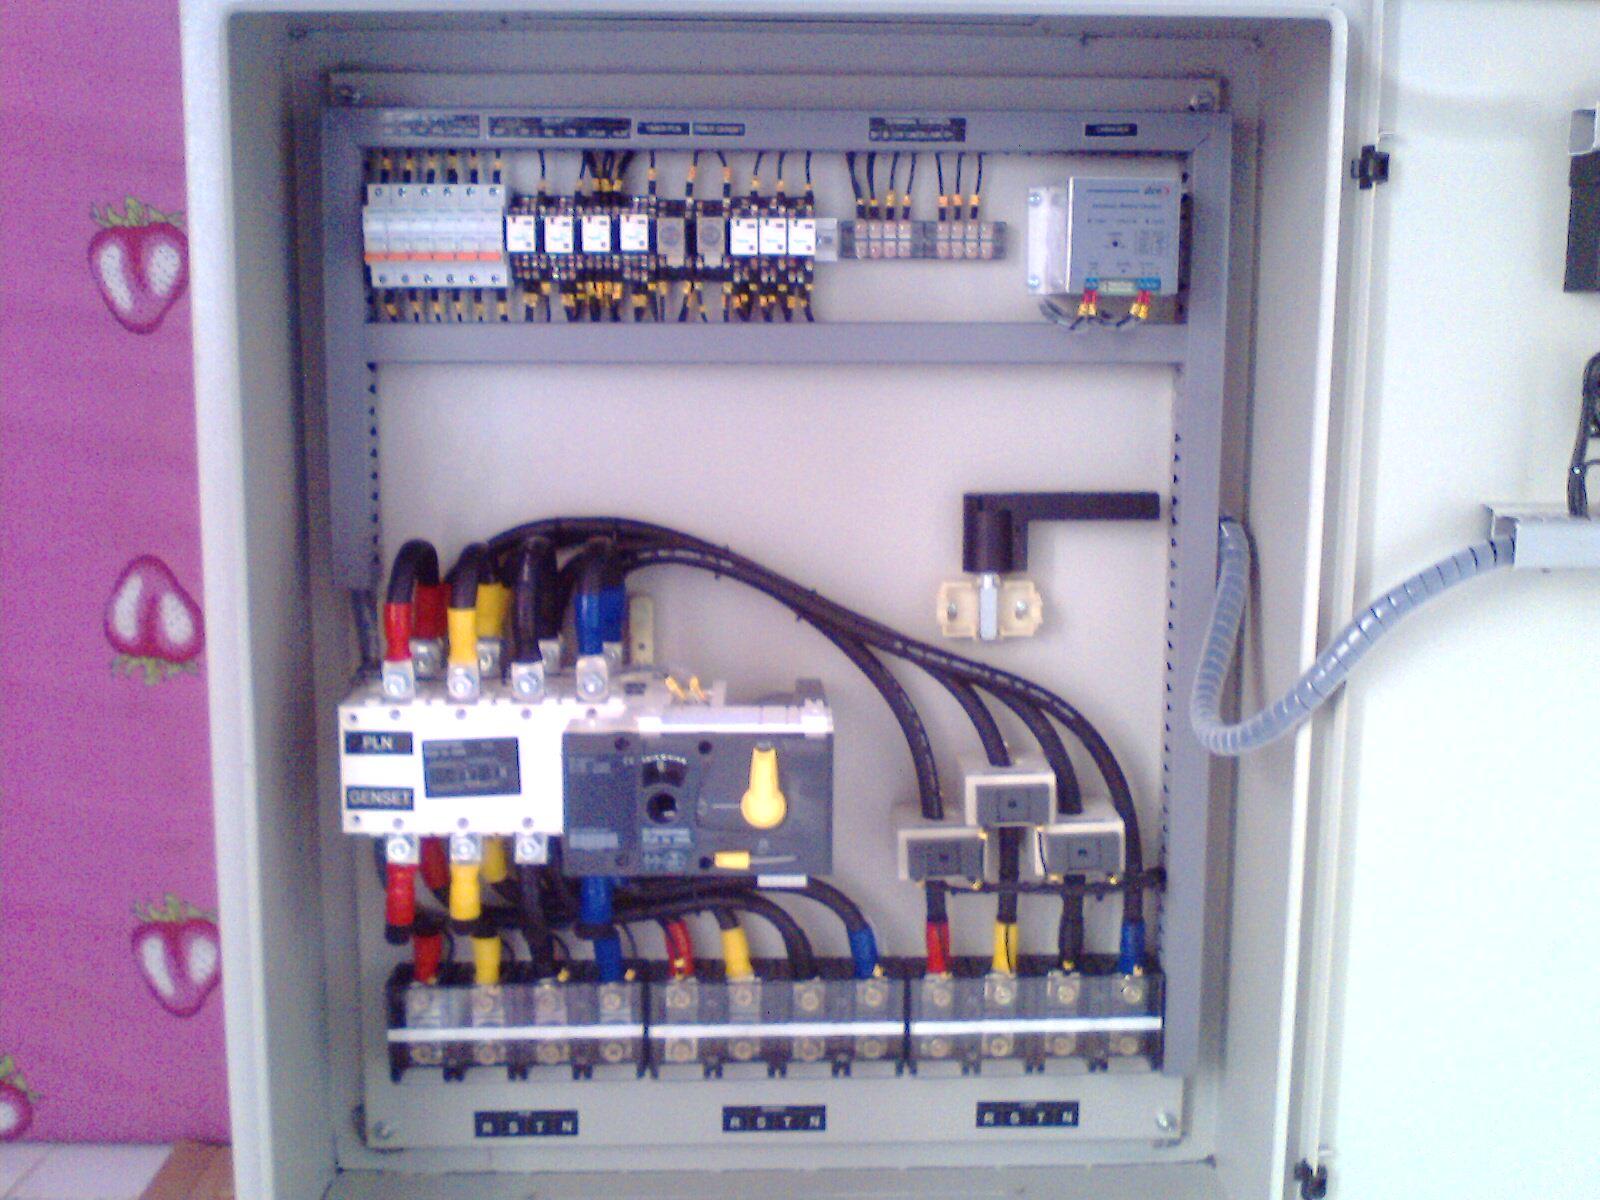 Wiring Ats Genset Diagram For Professional Panel Dan Amf Control Circuit Rh Esecrete Eu Generator Transfer